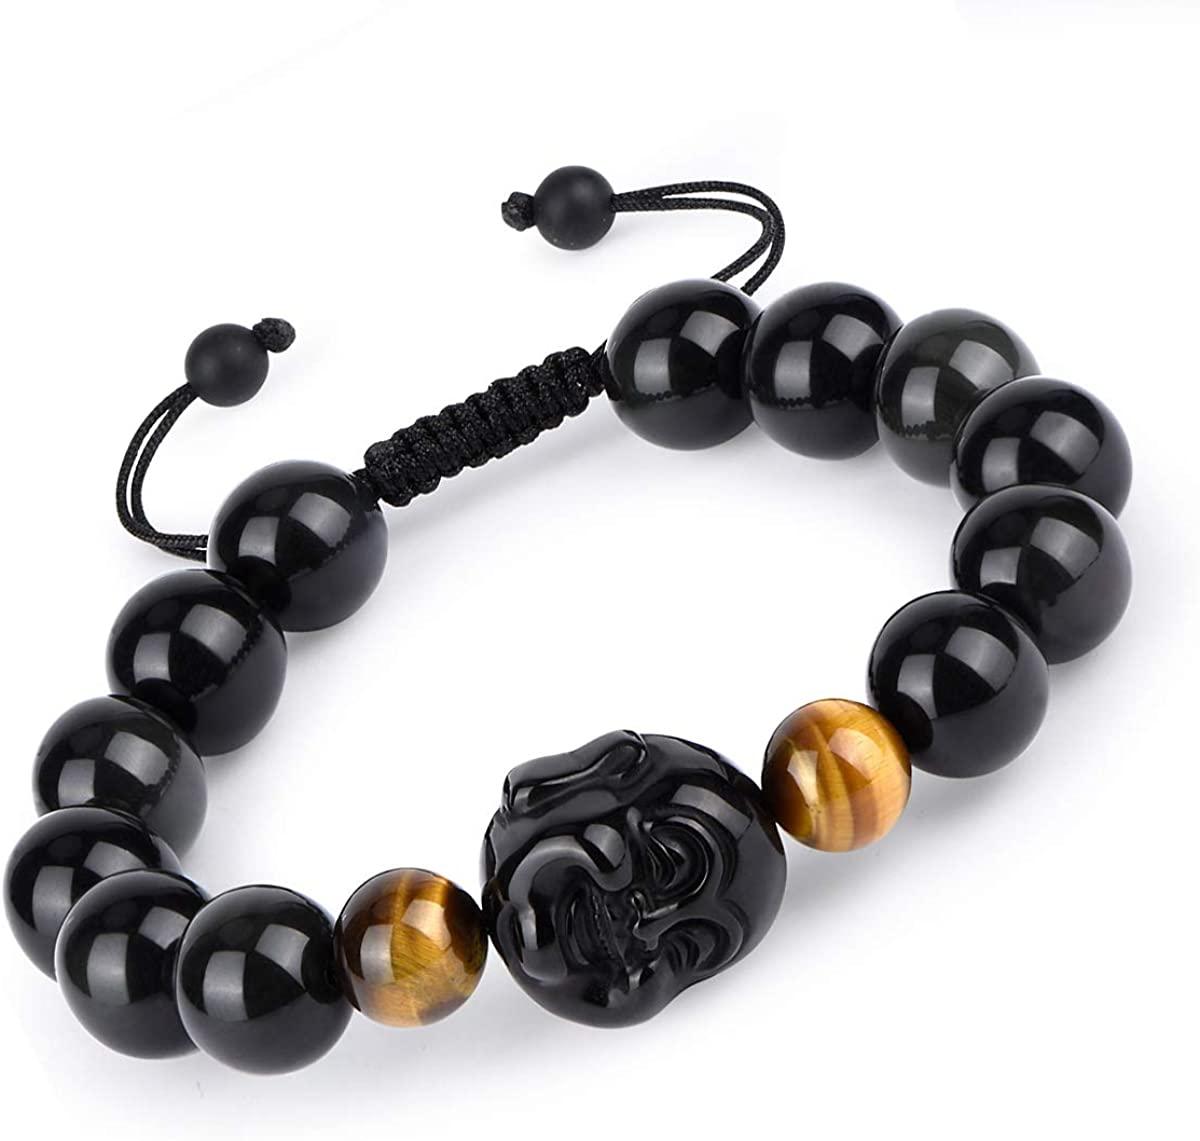 HASKARE Black Obsidian Wealth Bracelet - 10mm Natural Stone Beads Obsidian and Tiger Eye Buddha Chakra Yoga Bracelet 7